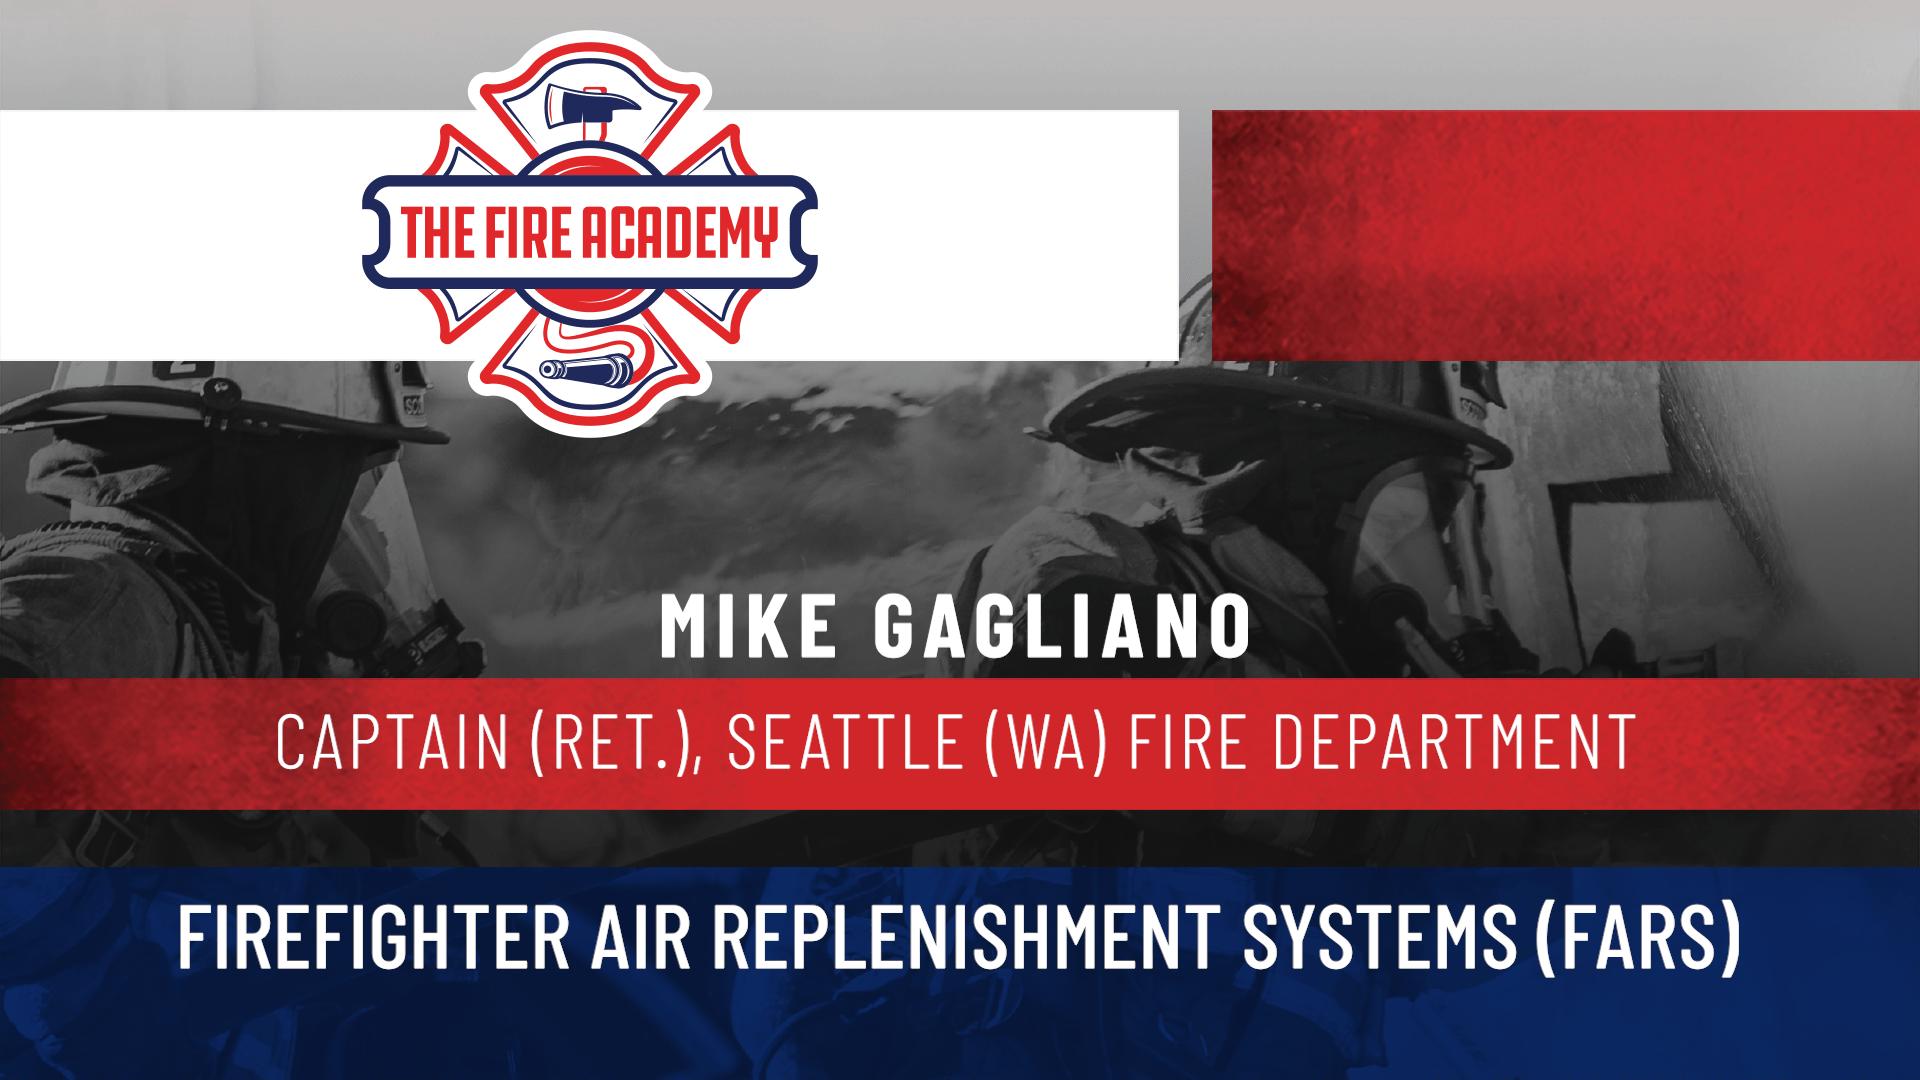 Firefighter Air Replenishment Systems (FARS)